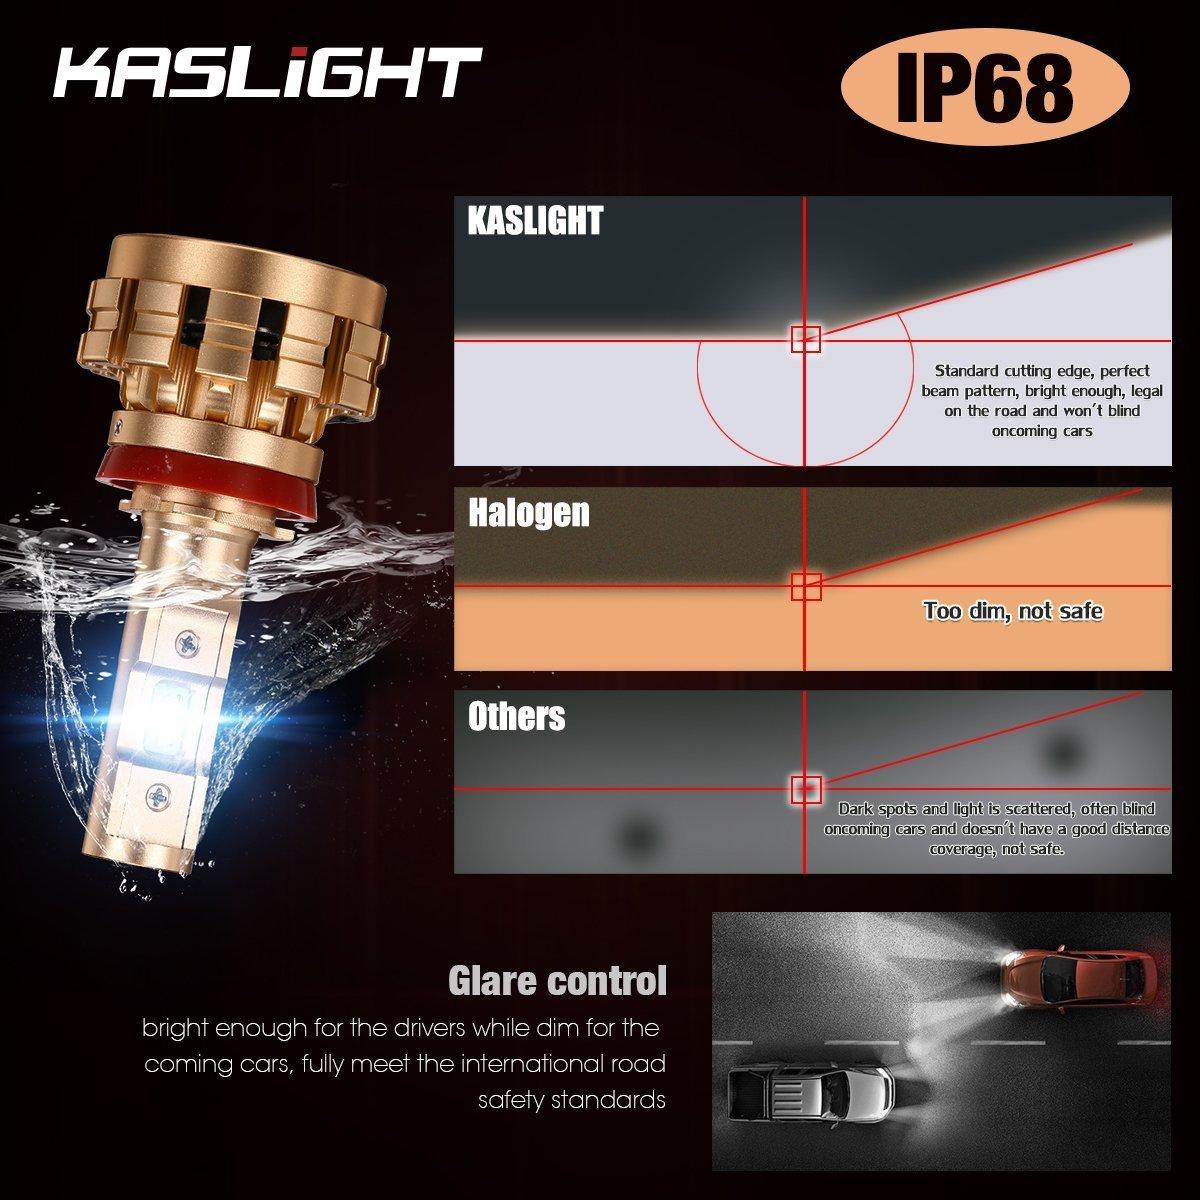 Kaslight Dot Approved H11 Led Headlight Bulb 6000k 1996 Tacoma Wiring Diagram Pnp Conversion Kit W Adjustable Beamip683 Yr Warrantyfire Proofh8 H9 Bulbs